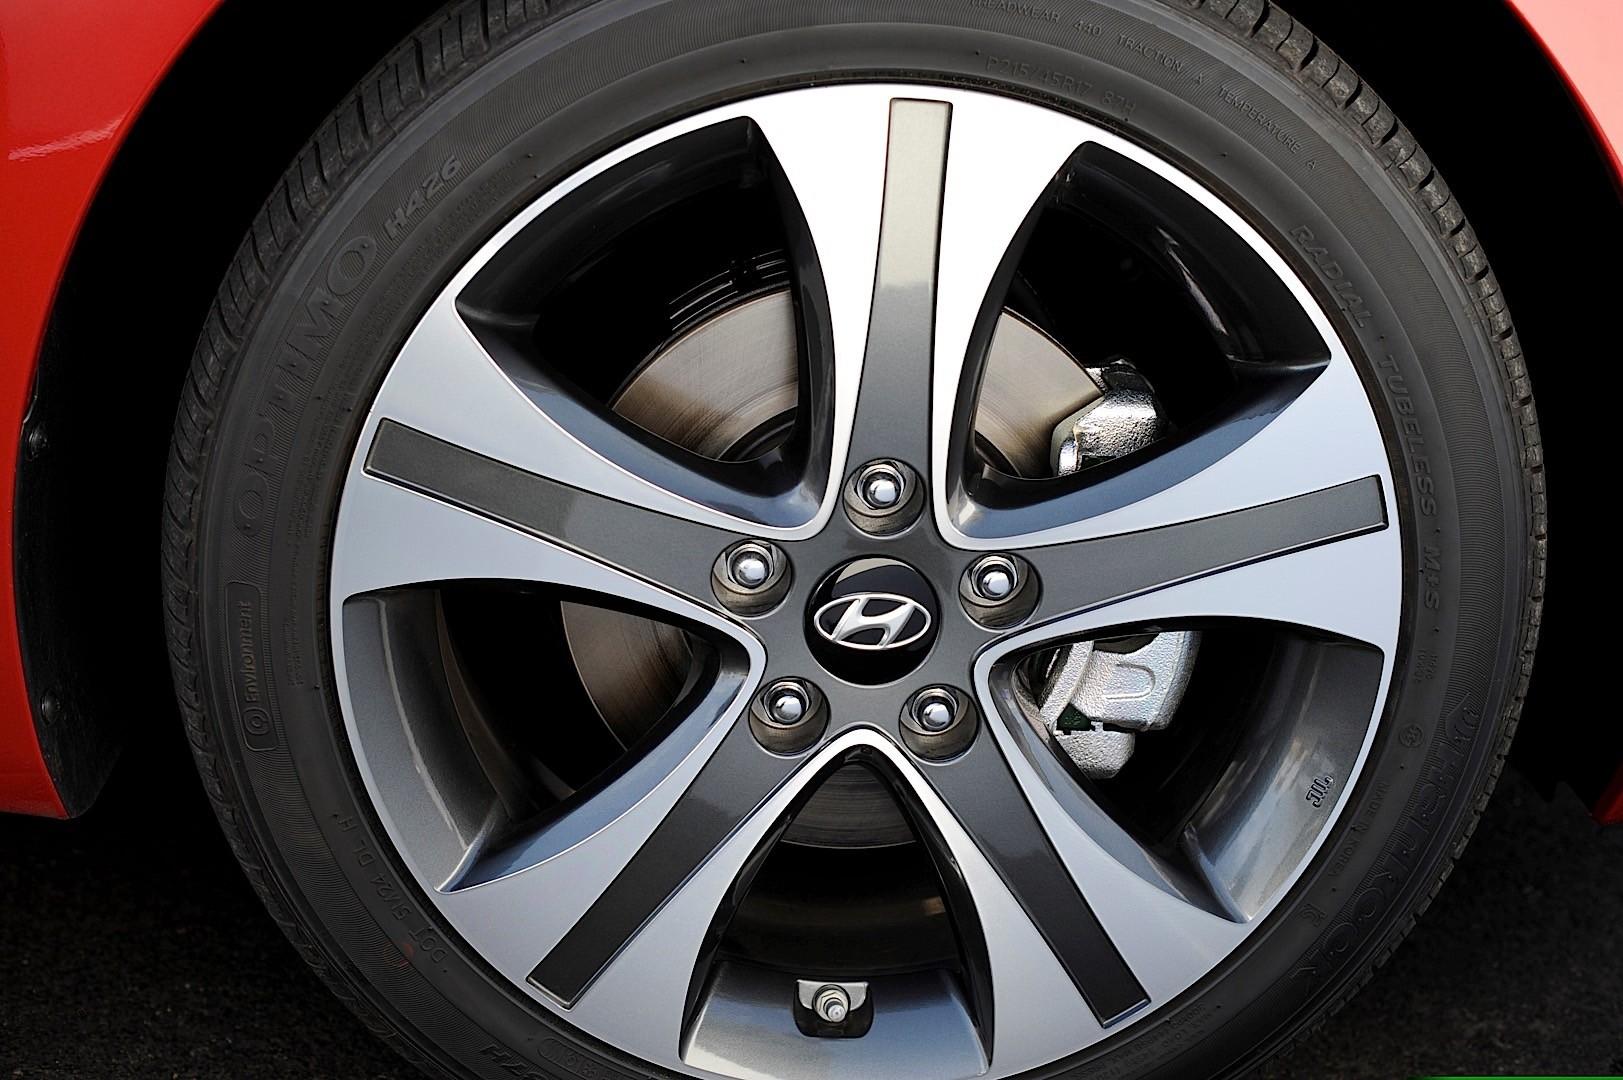 Hyundai Elantra Specs Photos 2010 2011 2012 2013 2014